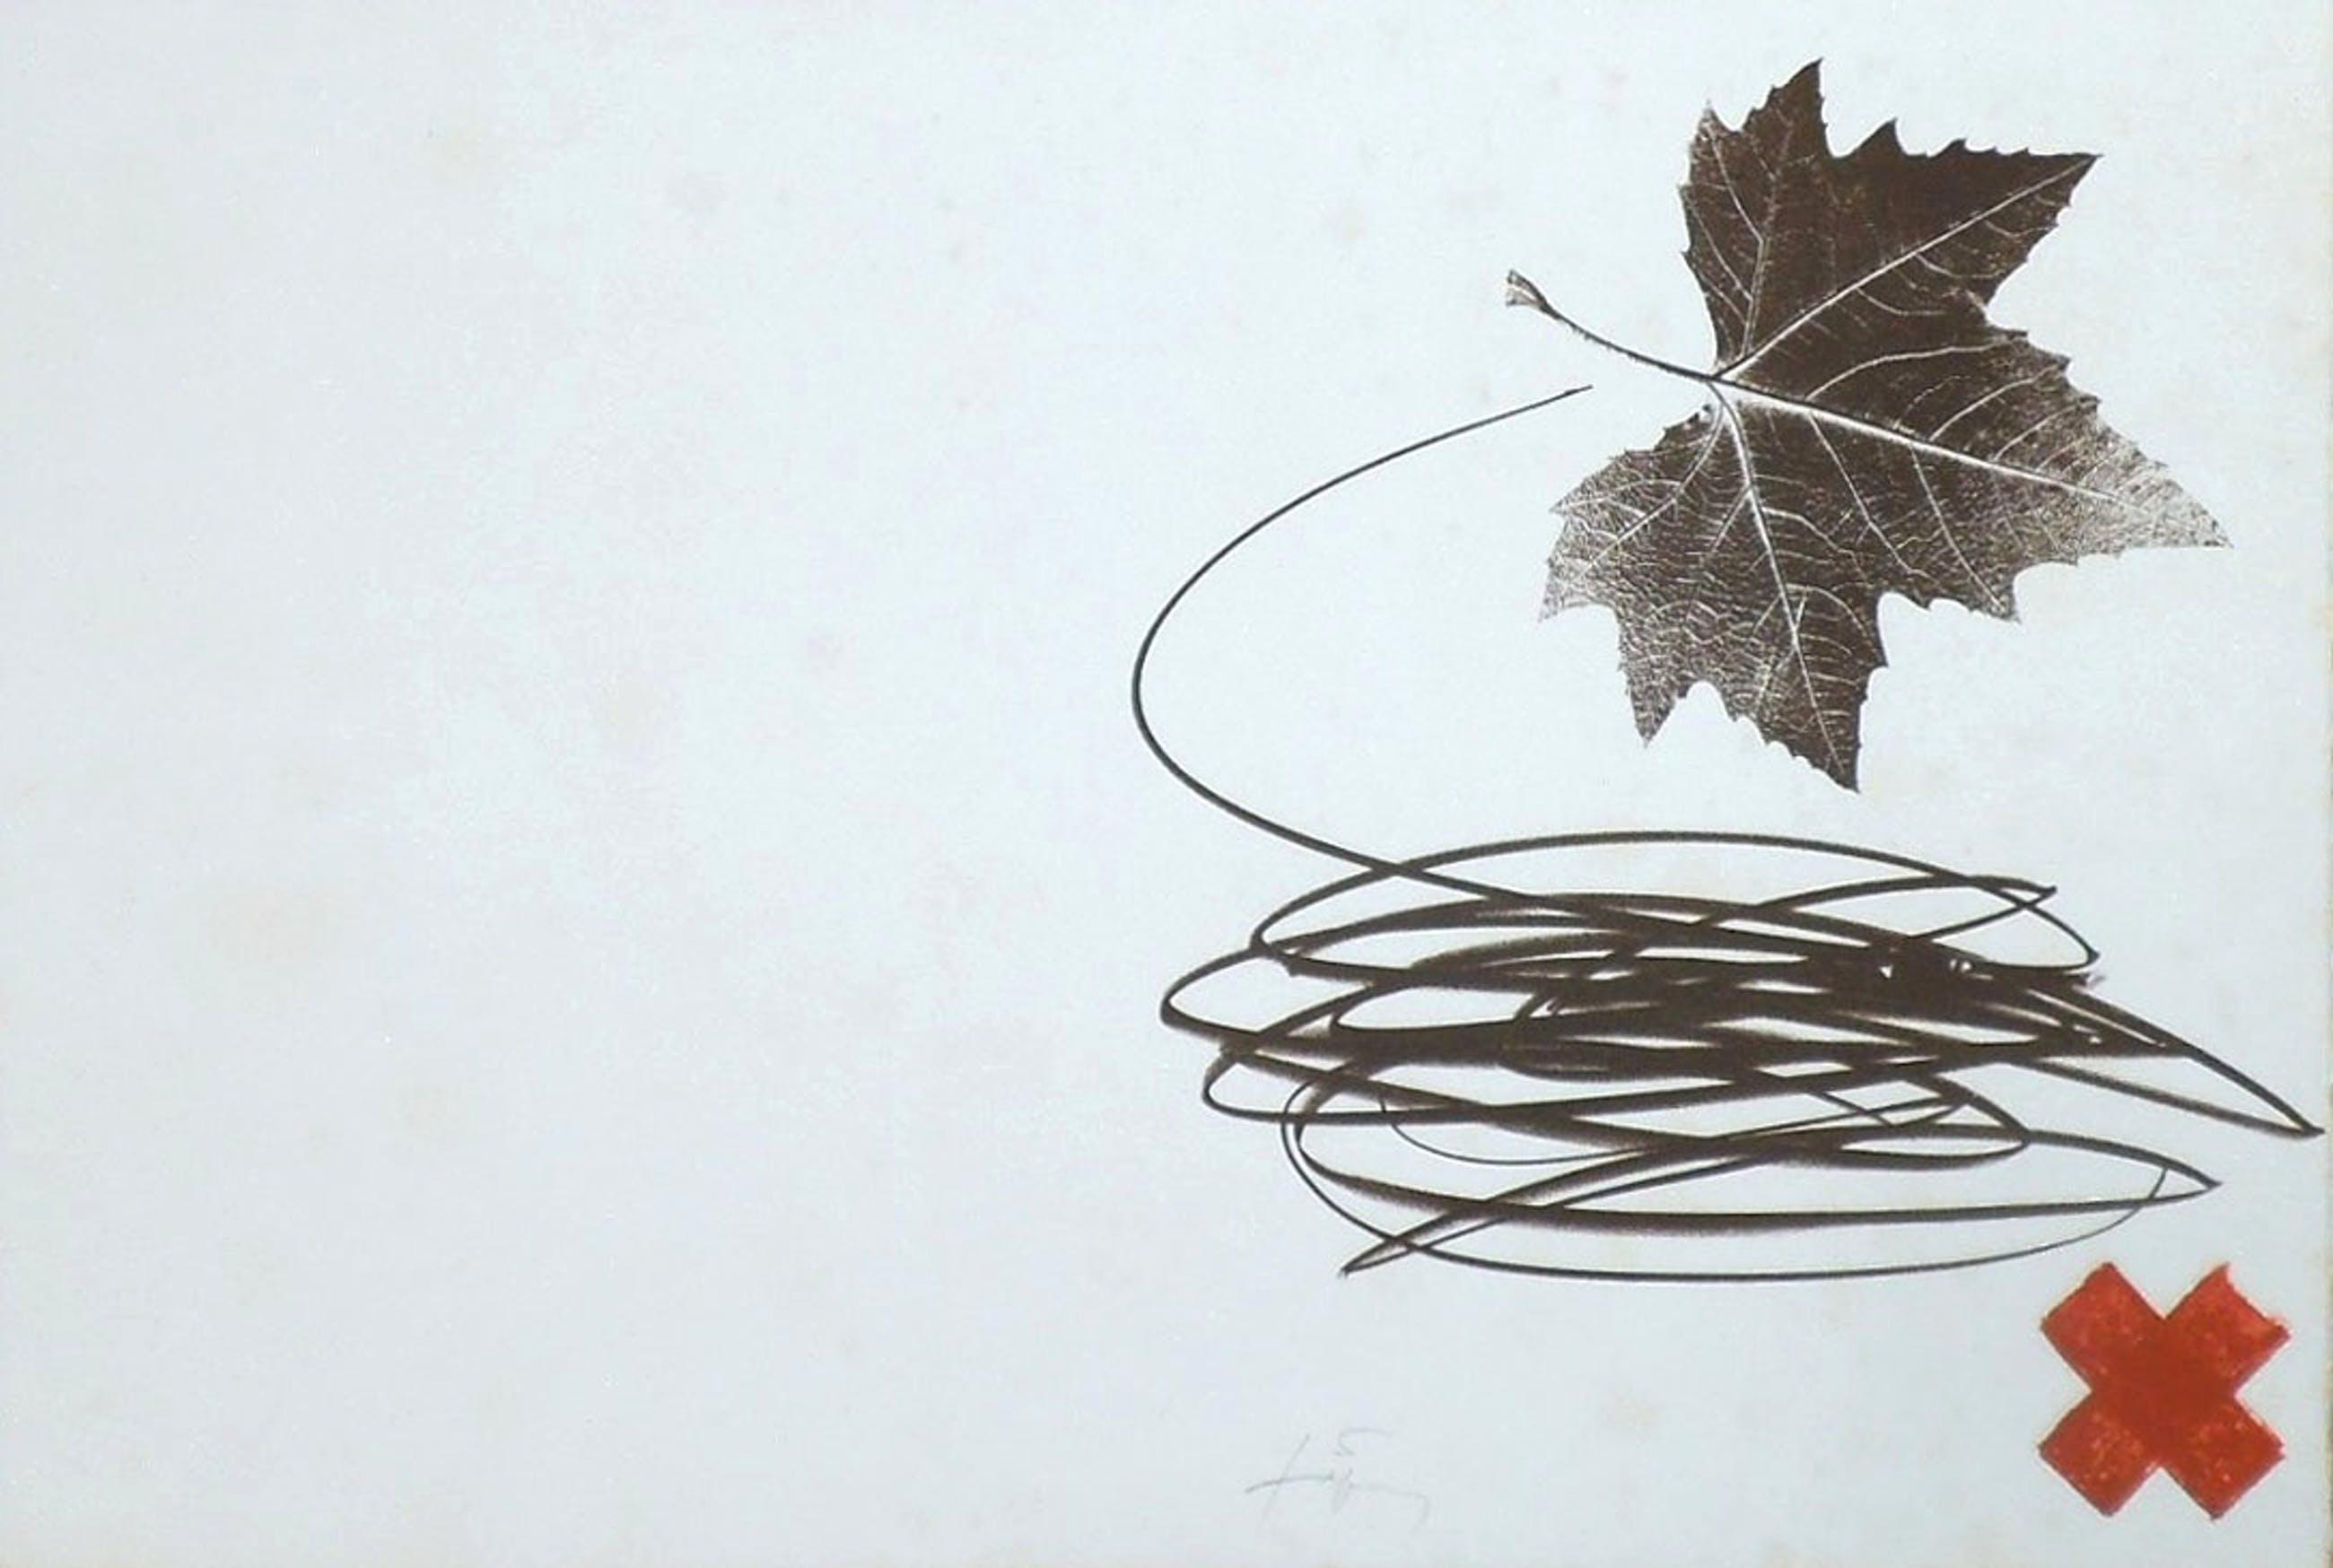 Antoni Tapies - Original-Lithographie, handsigniert, Galfetti 921 kopen? Bied vanaf 280!